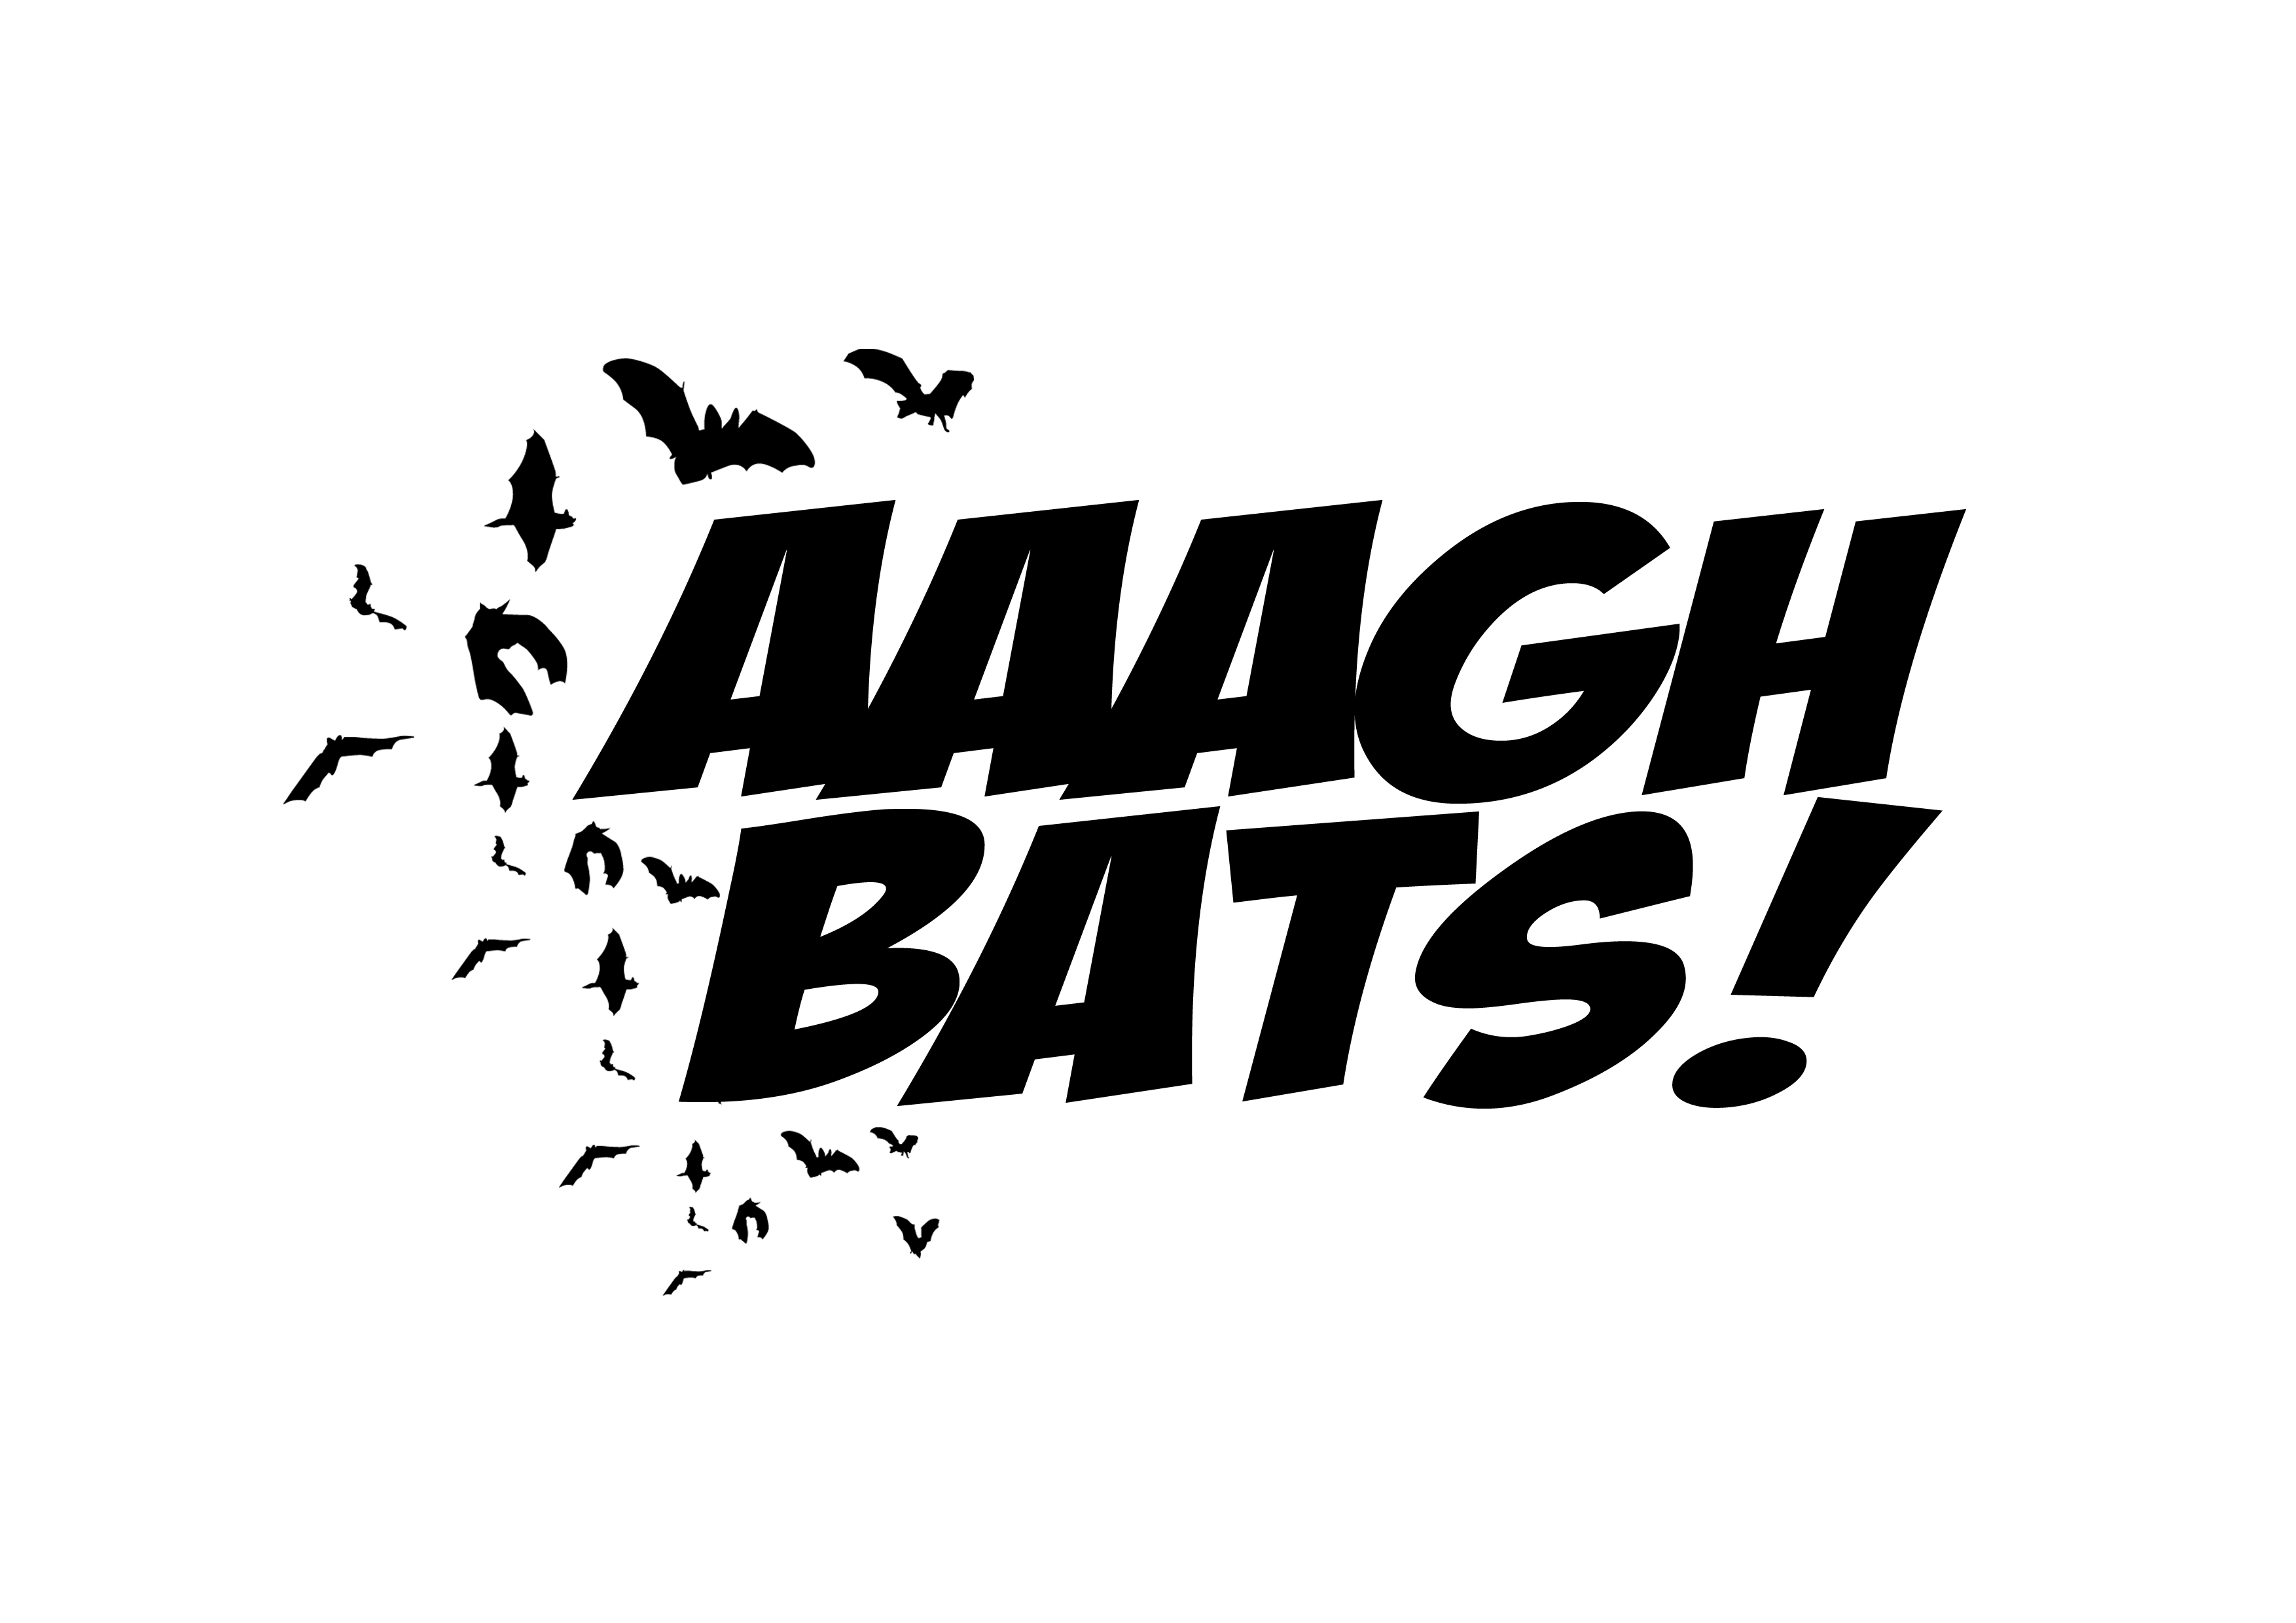 Bats t shirt design logo by minusthespazz on deviantart for Free t shirt logos